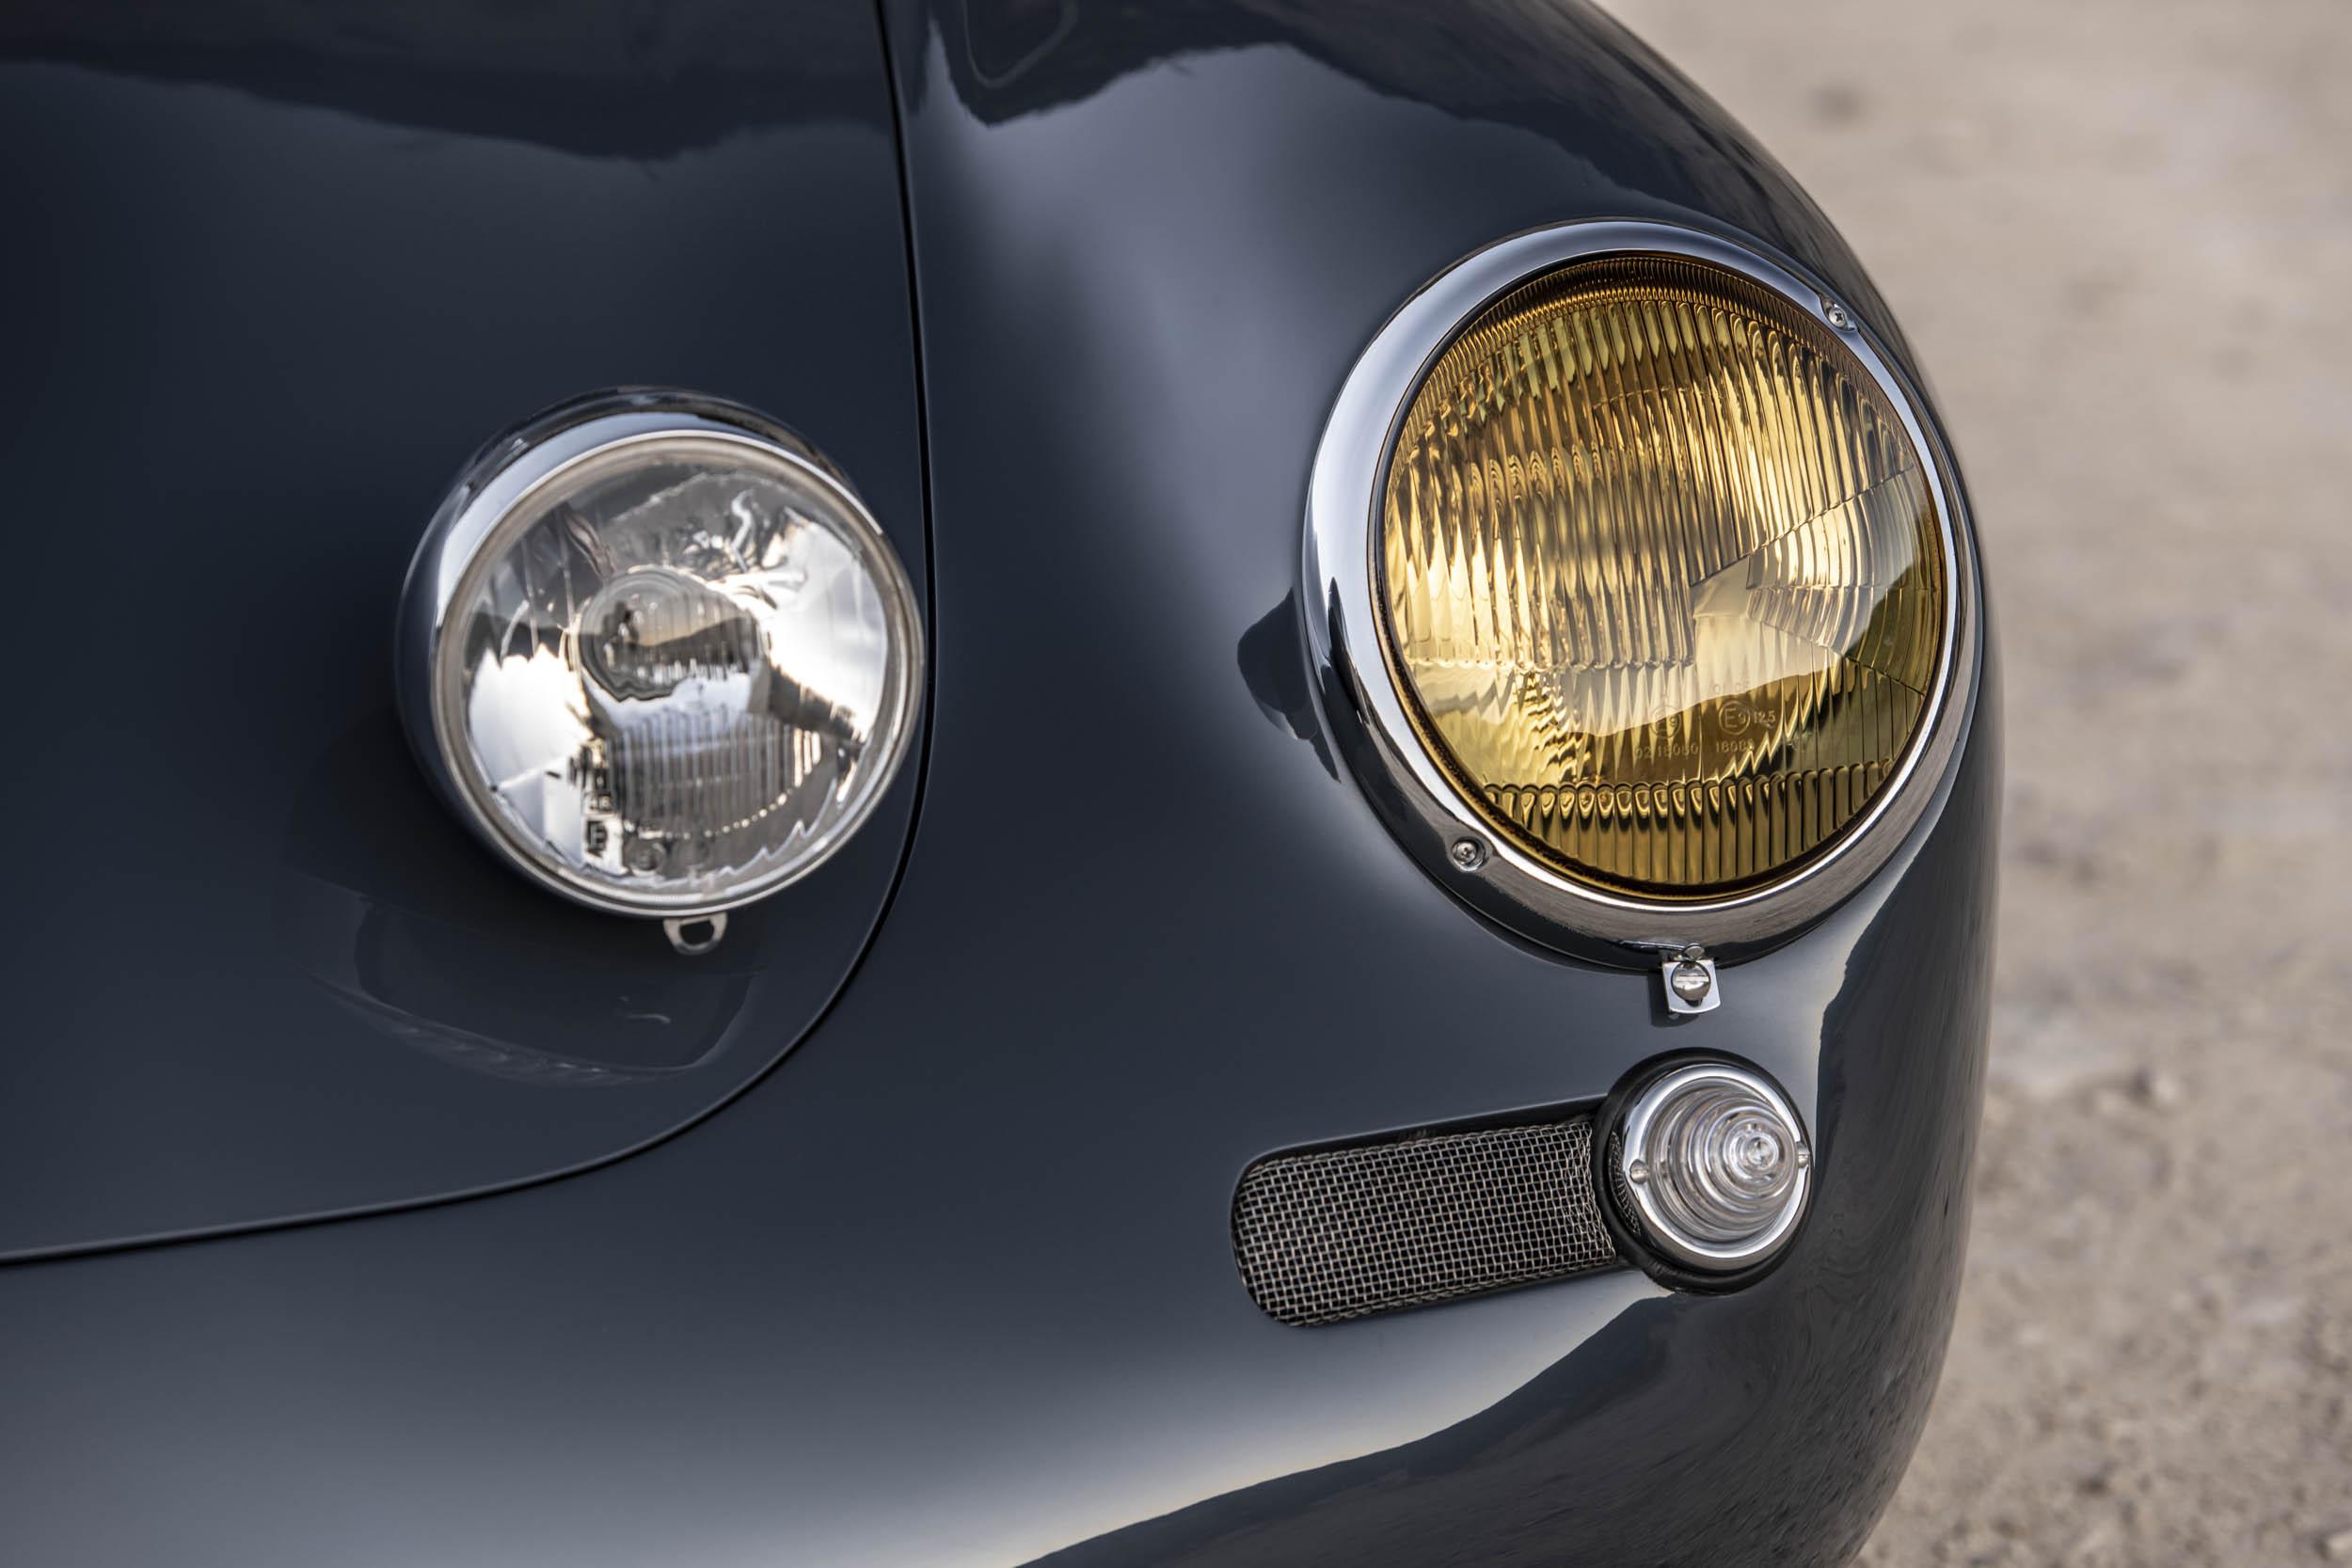 Emory Porsche 356 C4S Allrad headlights